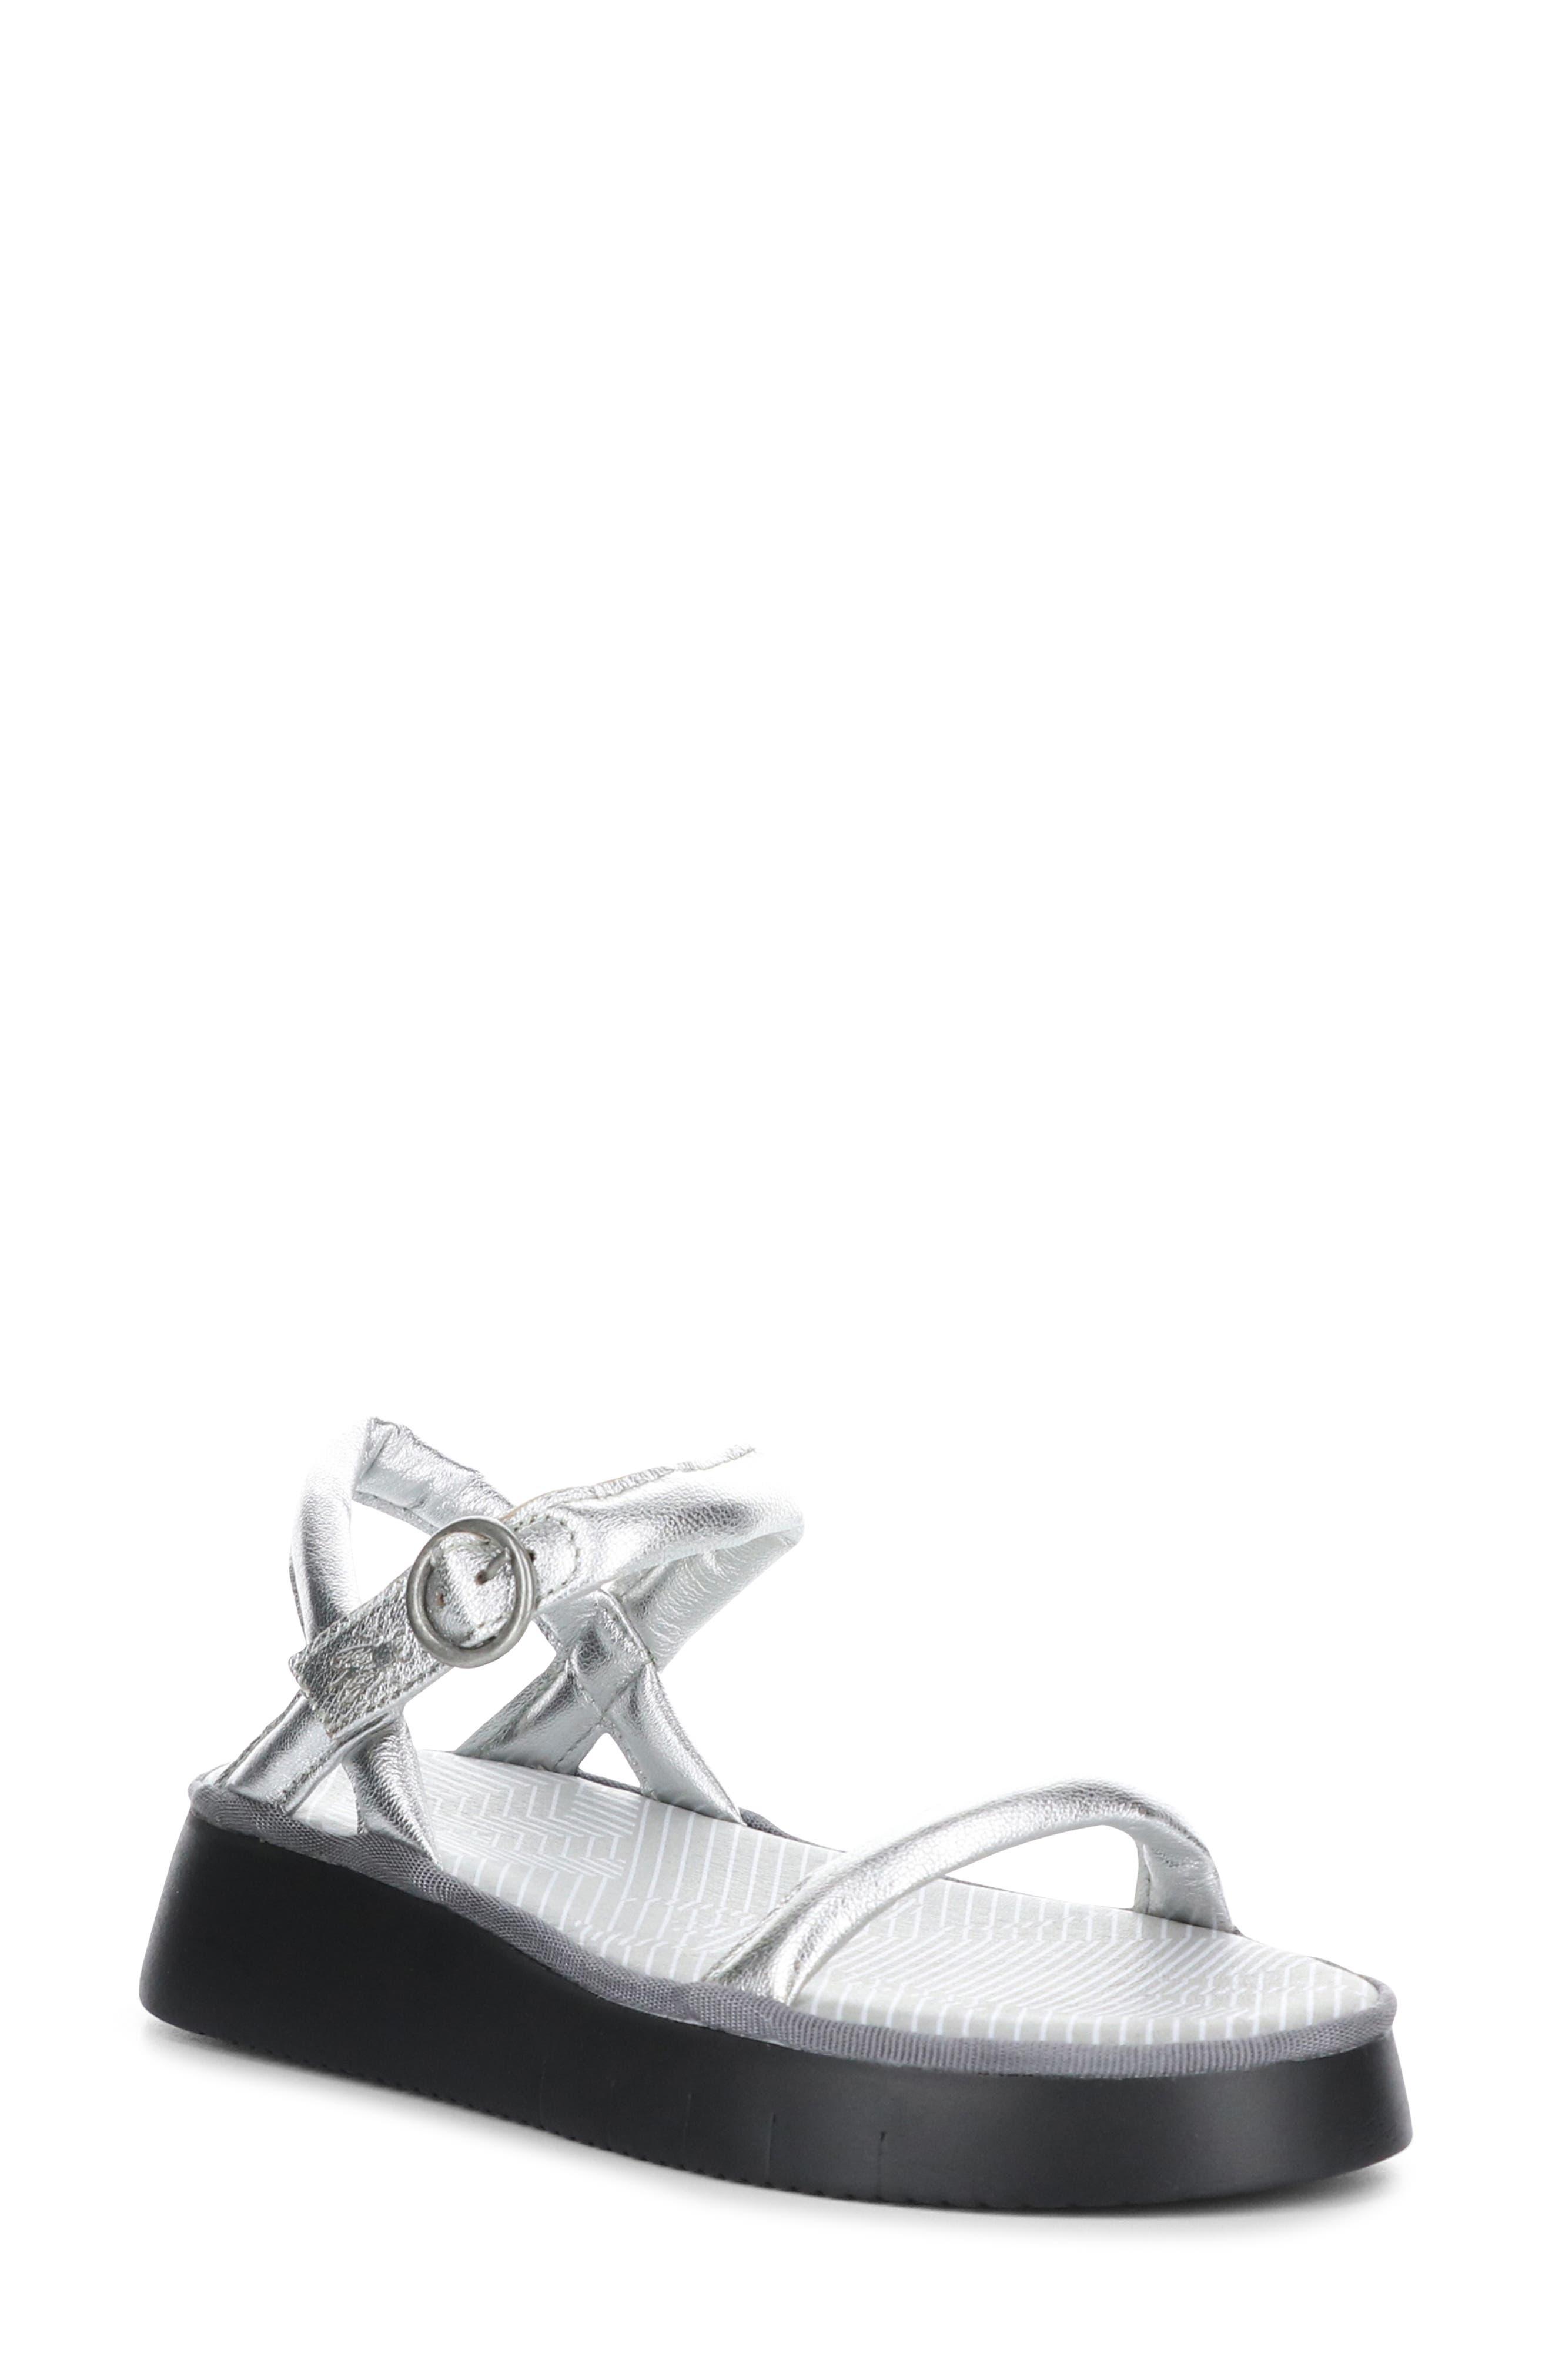 Ceto Platform Sandal